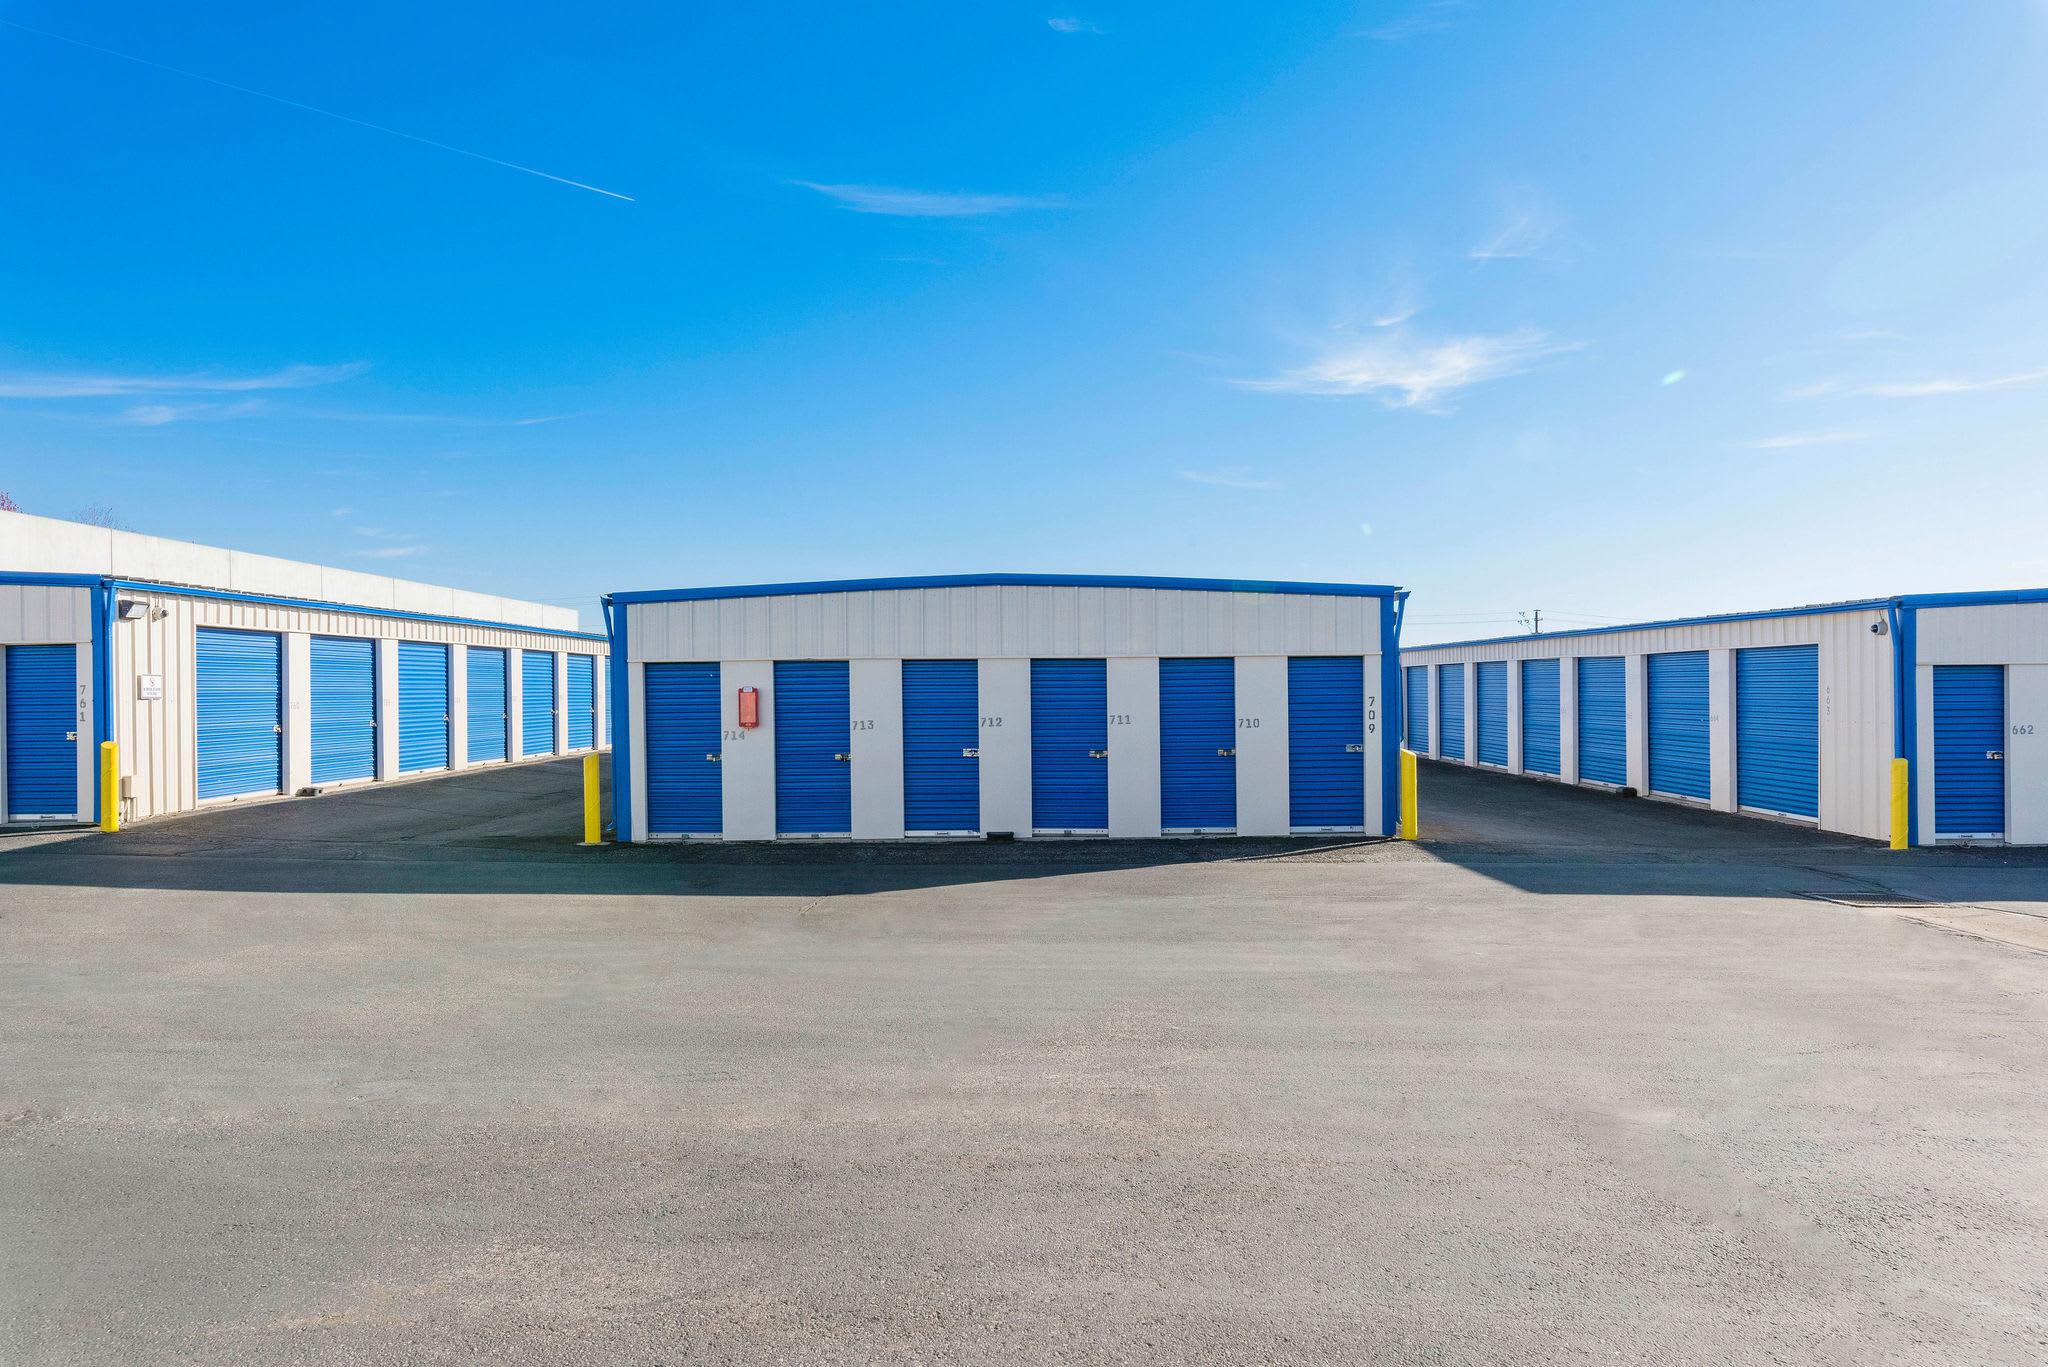 Drive up storage at Stor'em Self Storage in Orem, Utah